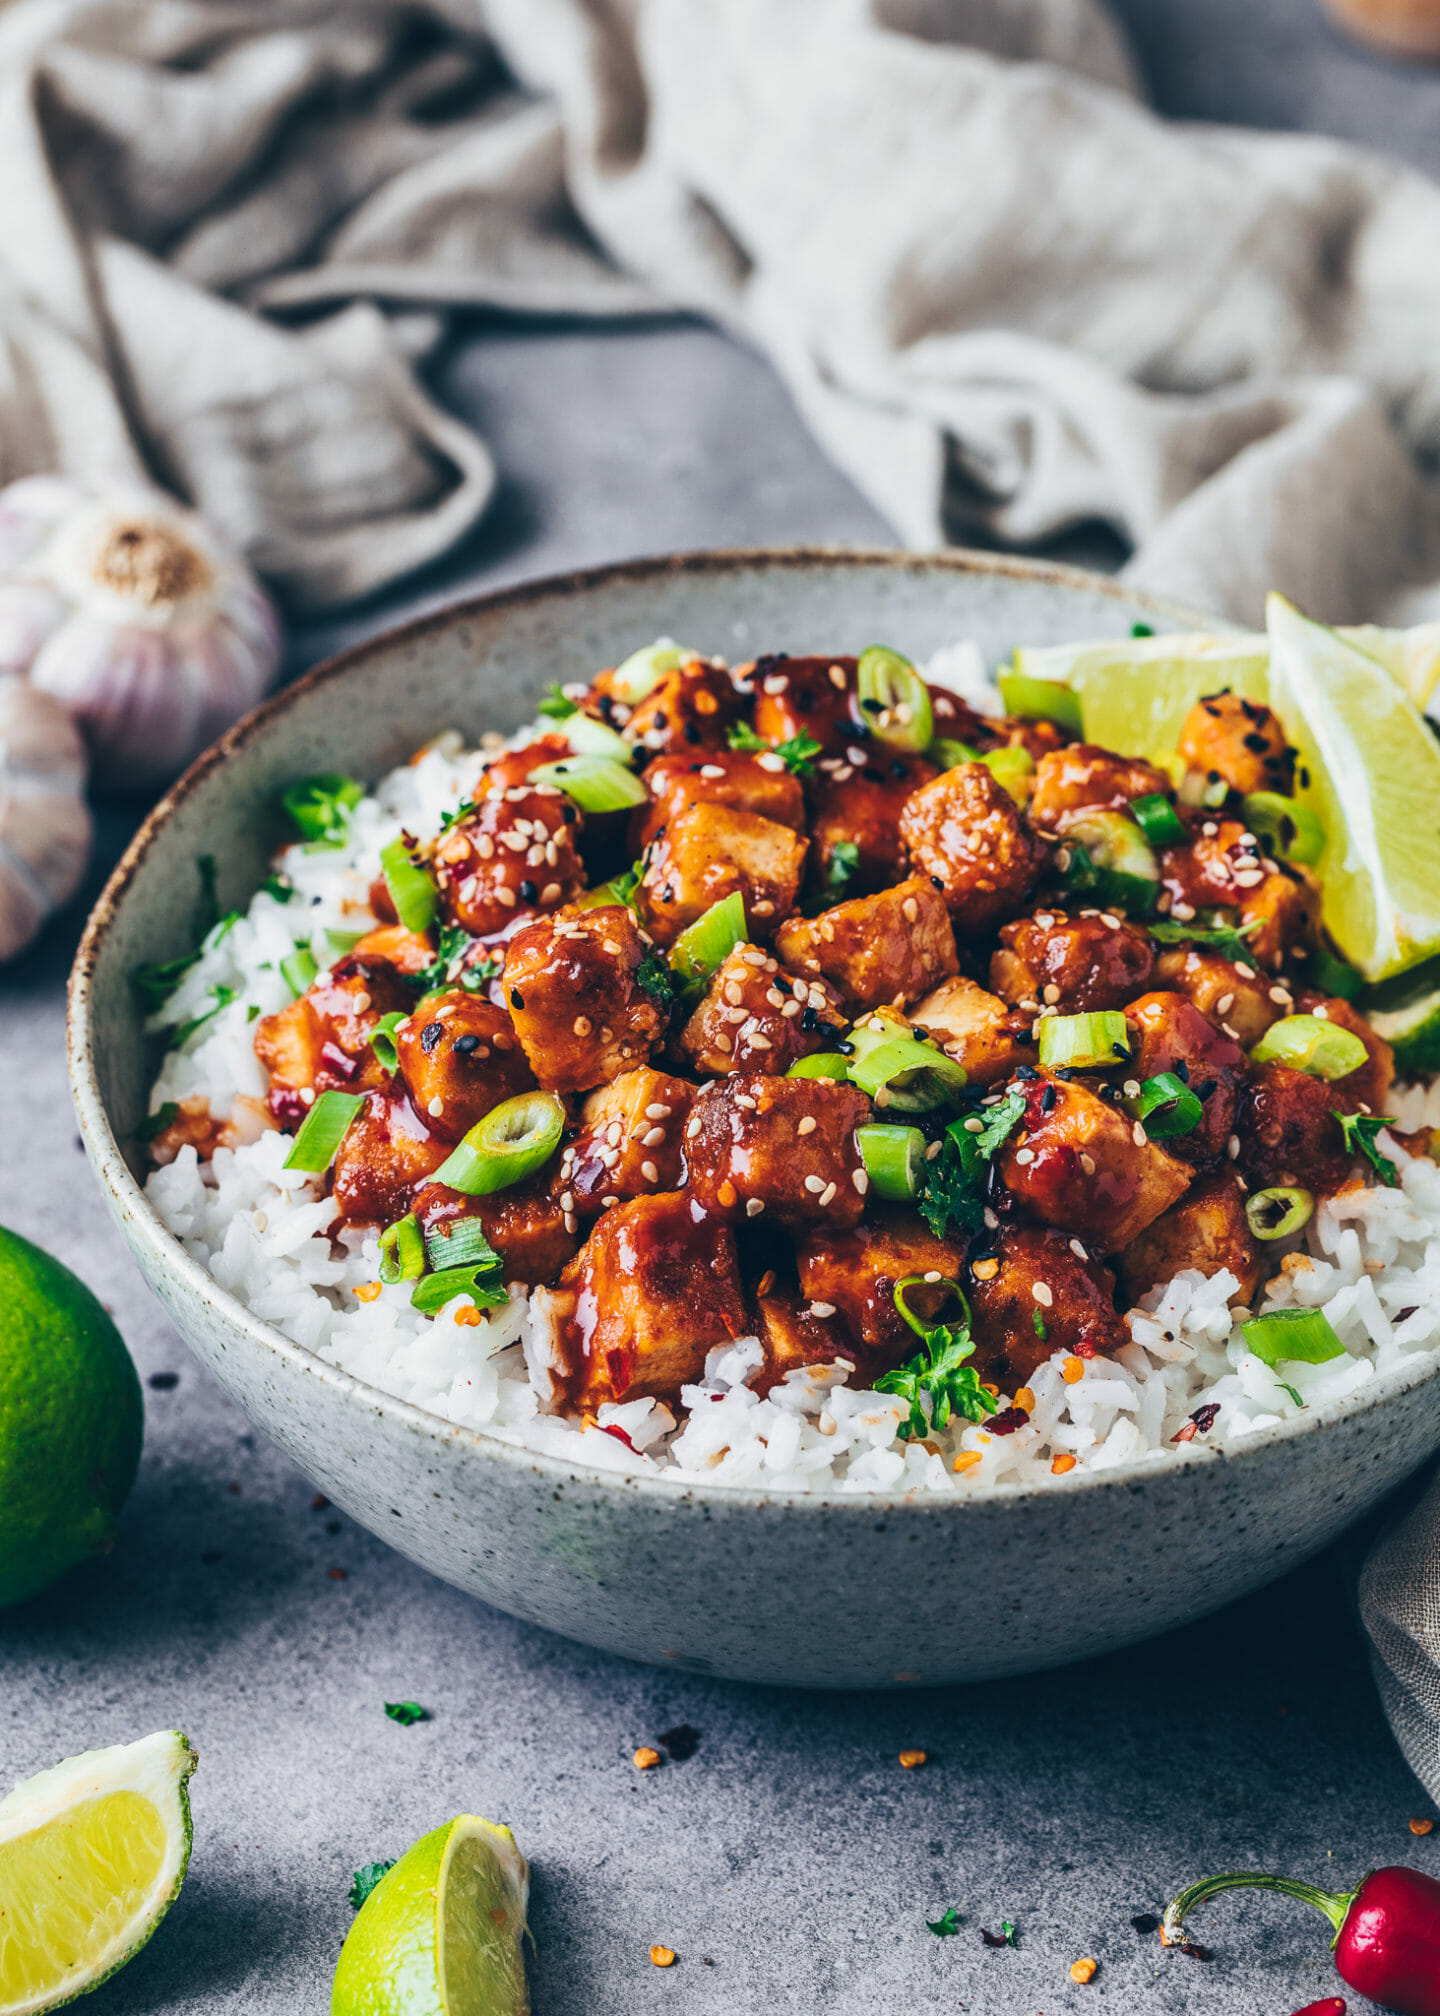 Crispy Tofu with sticky General Tso's sauce